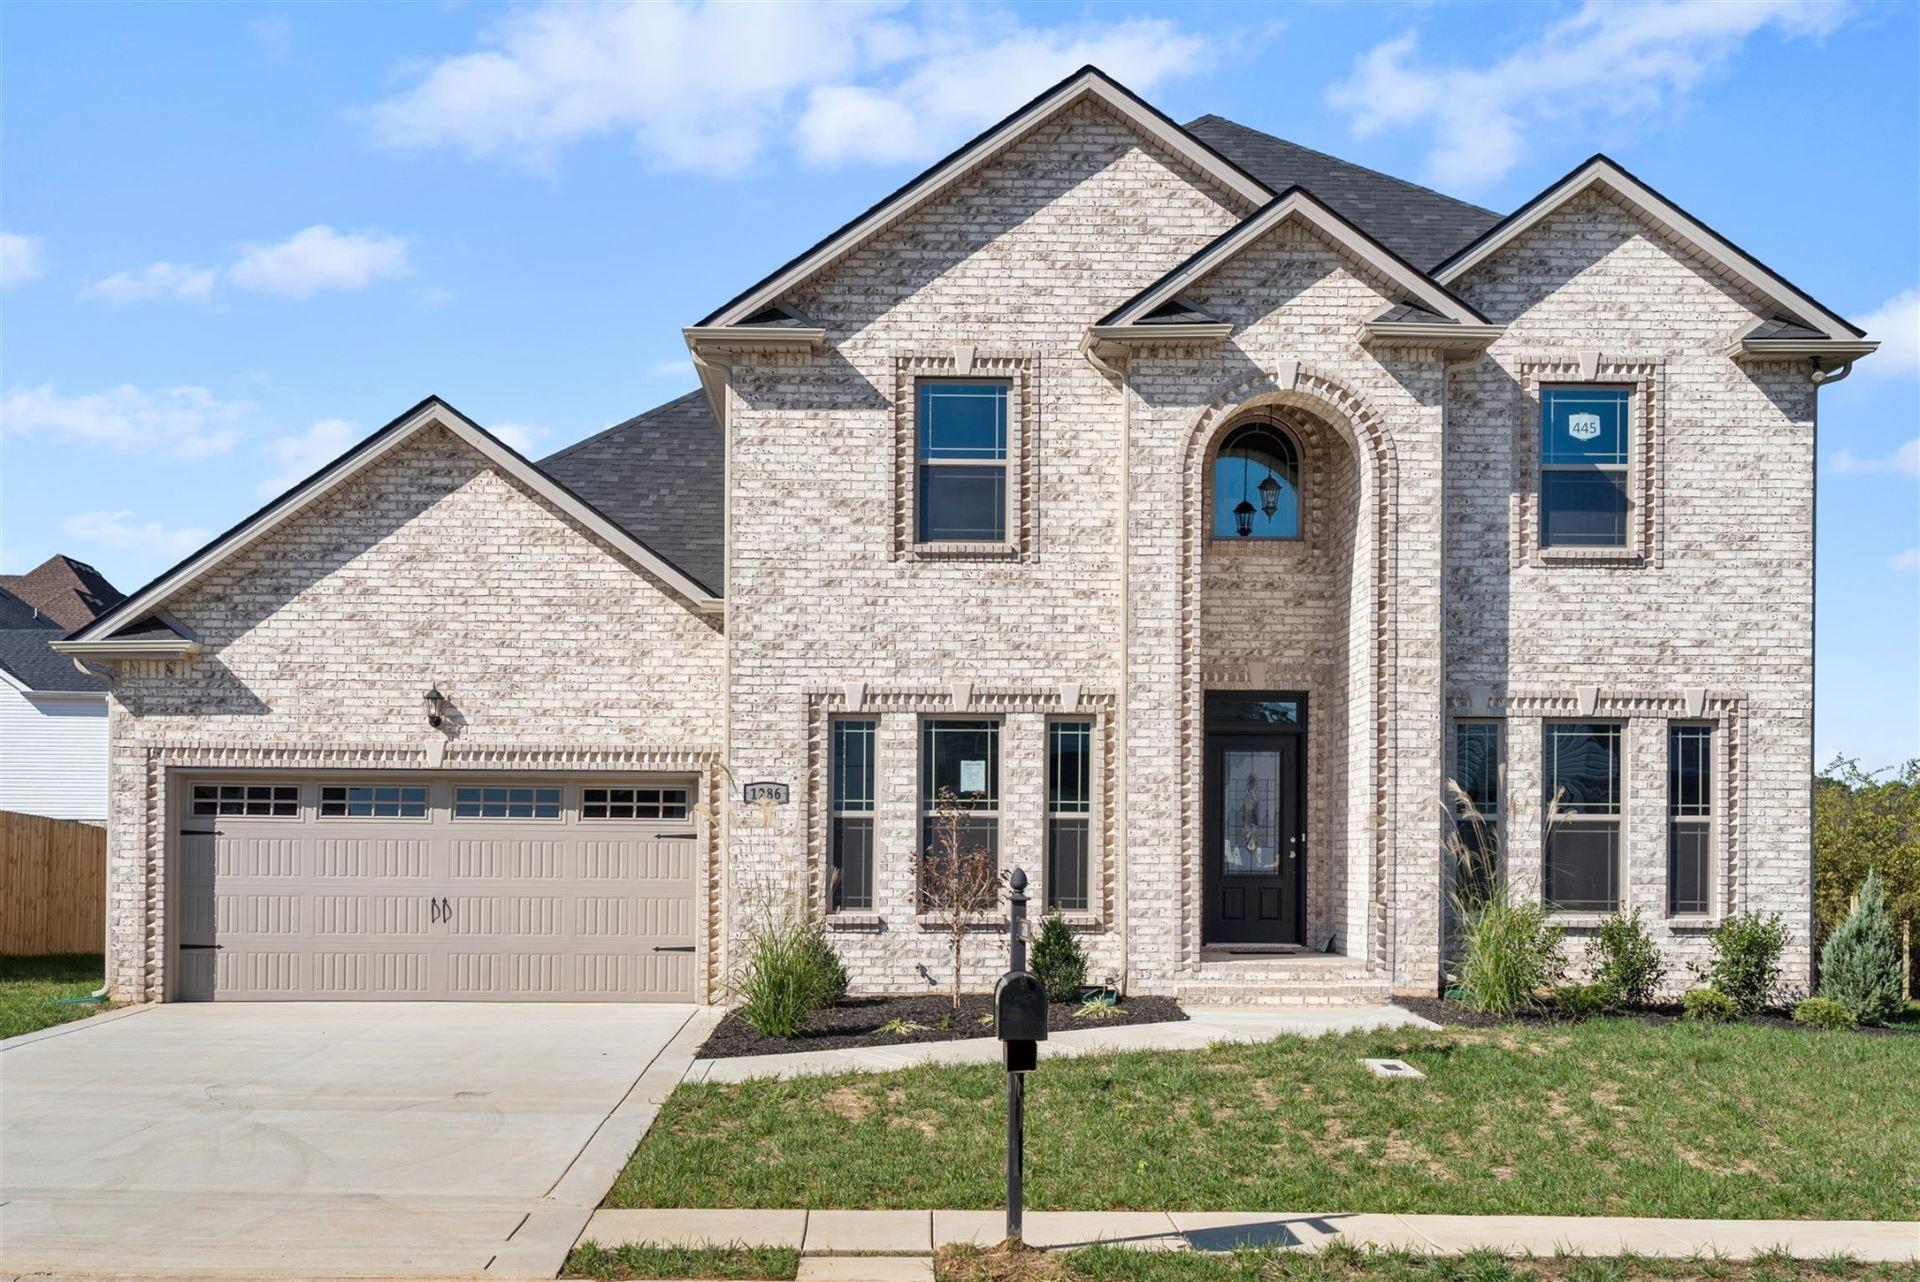 628 Farmington Lot 628, Clarksville, TN 37043 - MLS#: 2189762